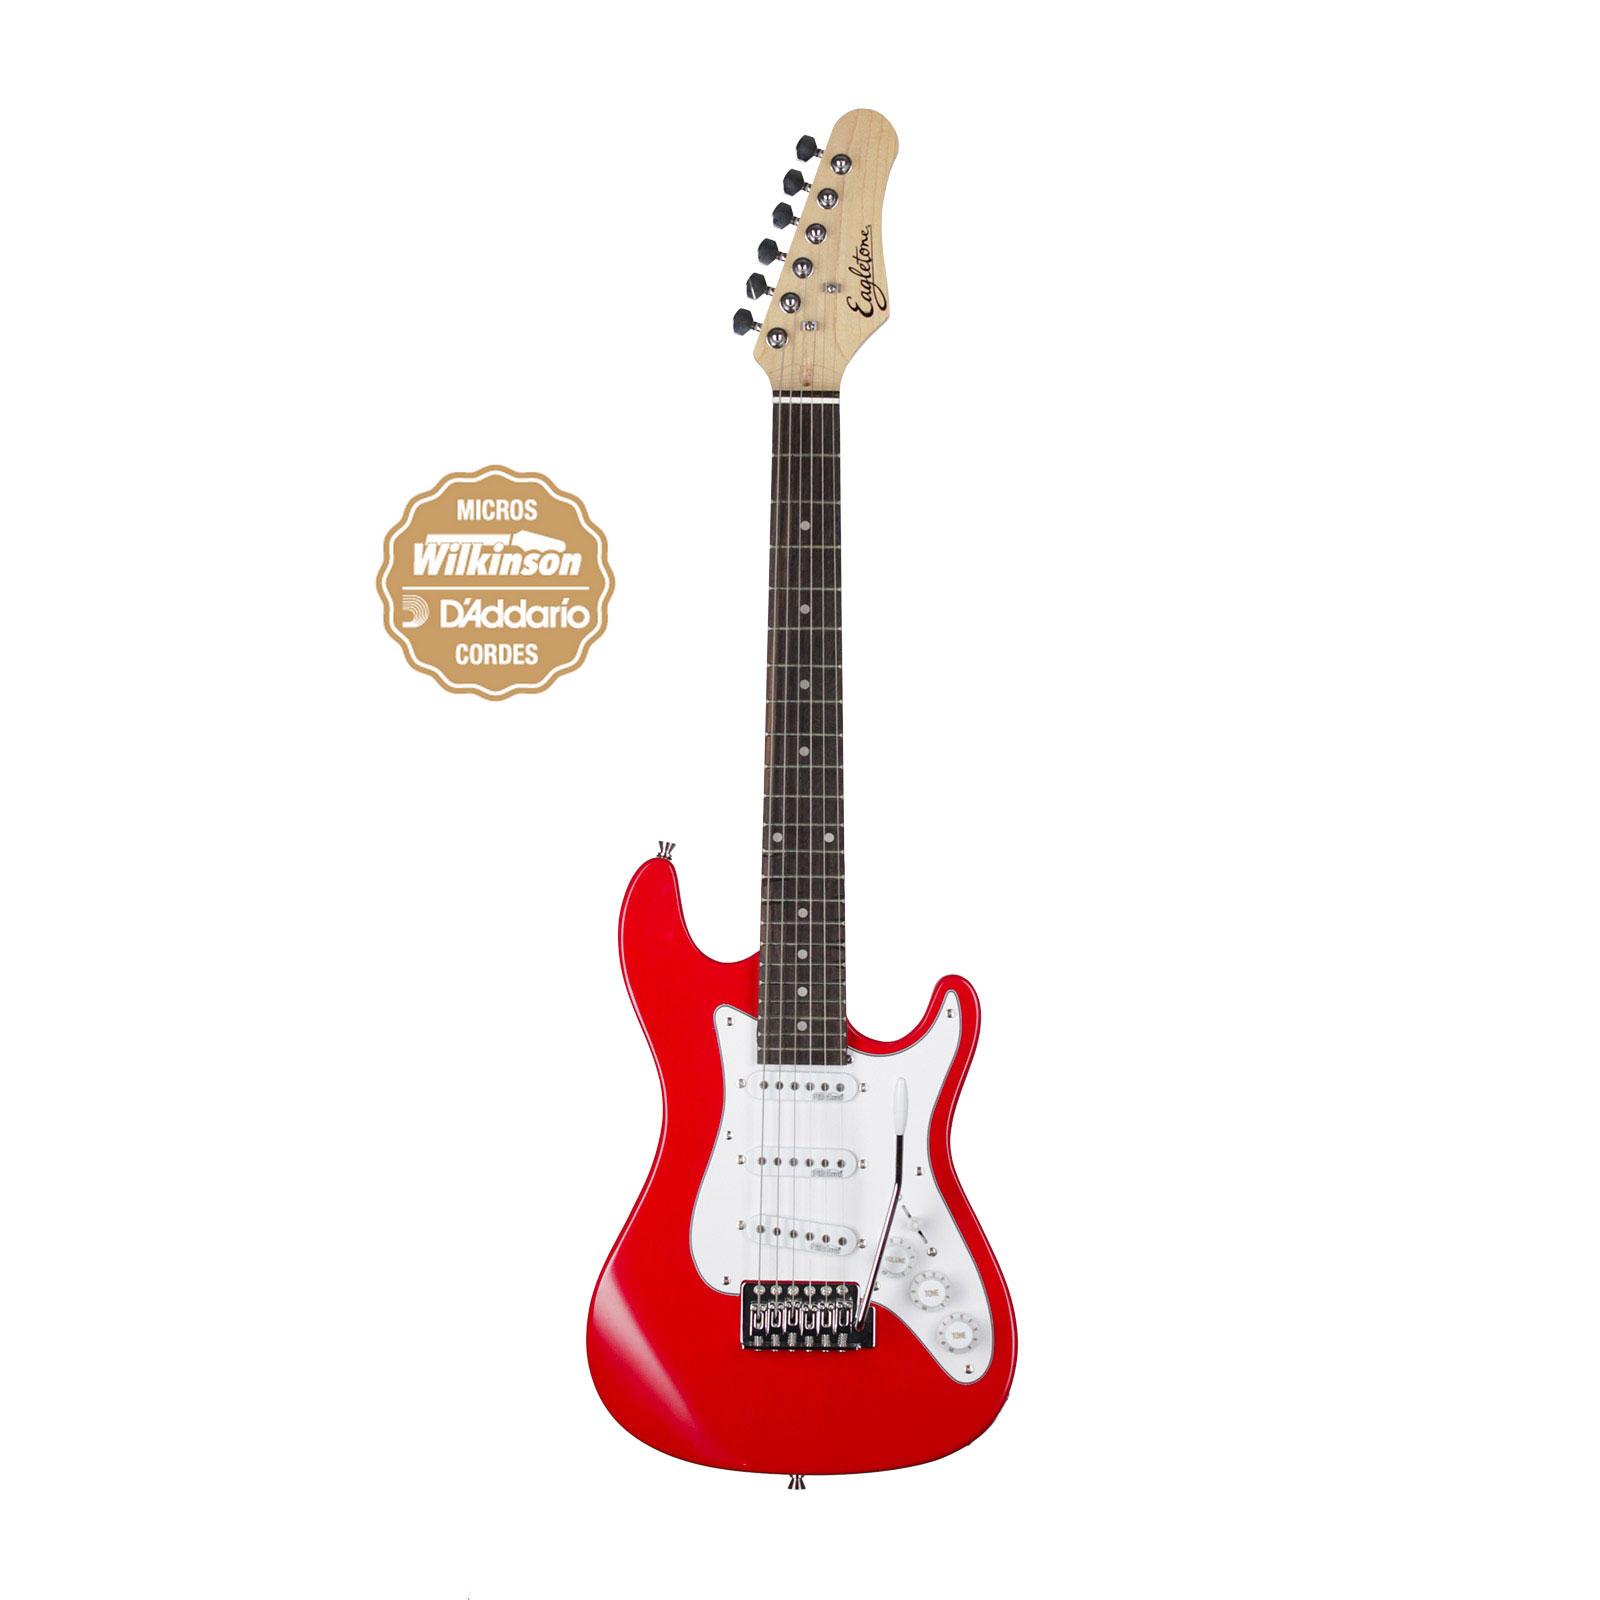 eagletone phoenix junior red guitares pour enfants guitare achat en ligne free. Black Bedroom Furniture Sets. Home Design Ideas